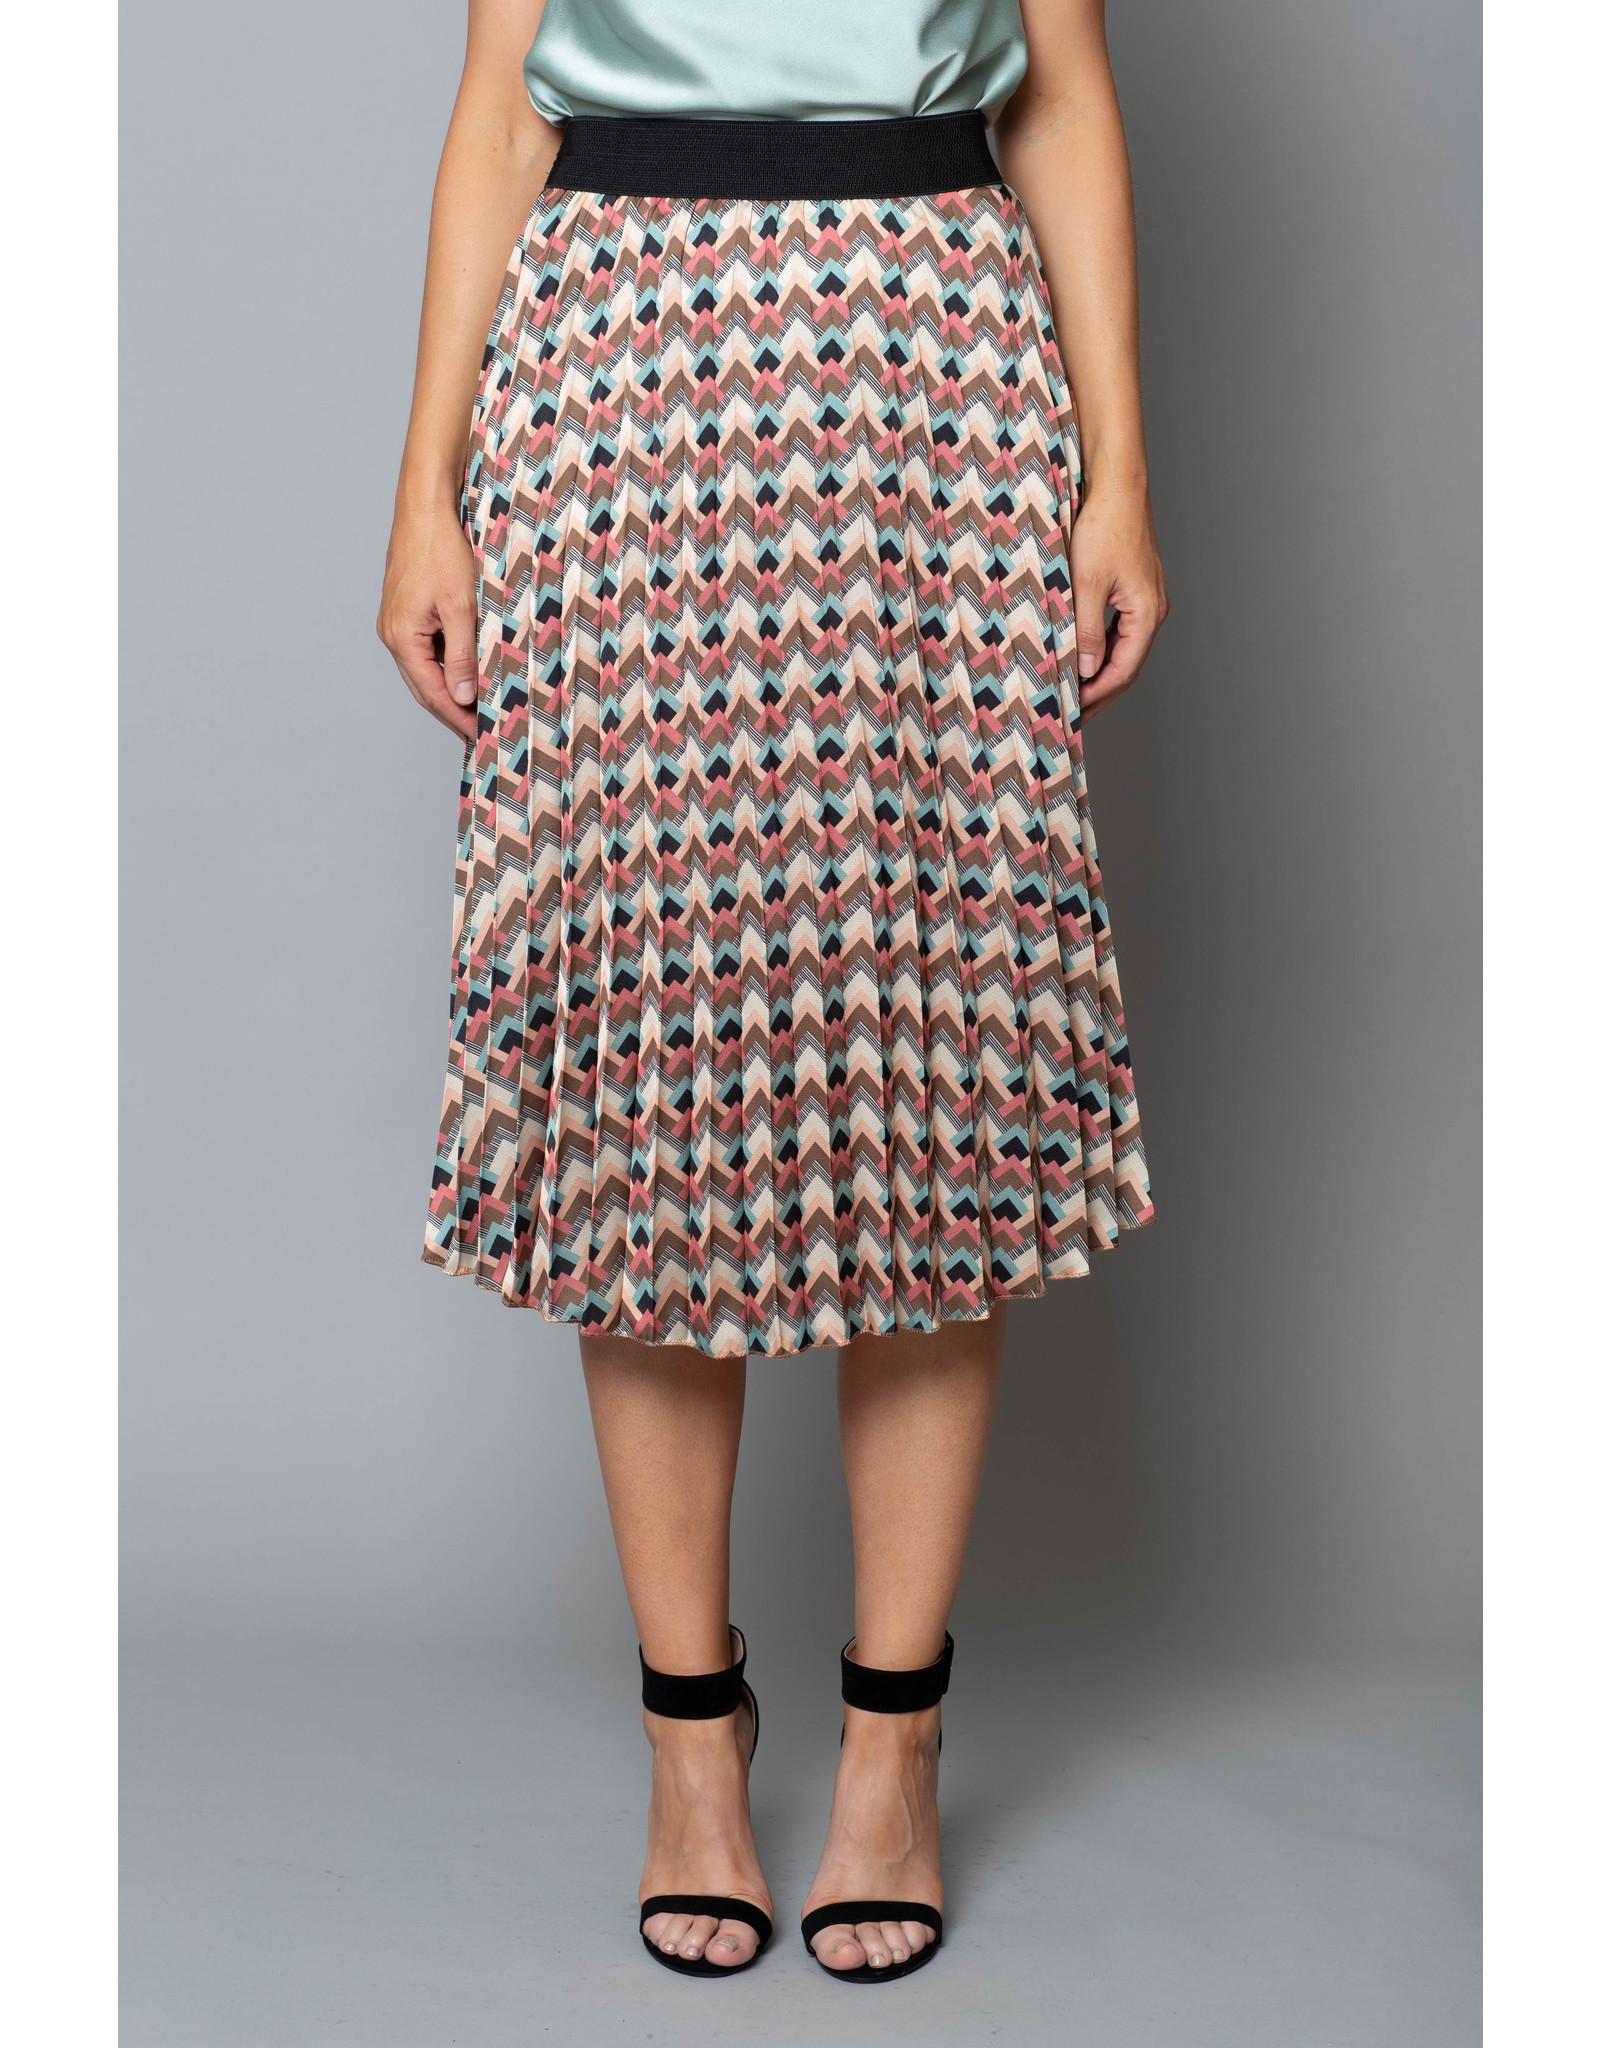 Peruzzi Print Skirt